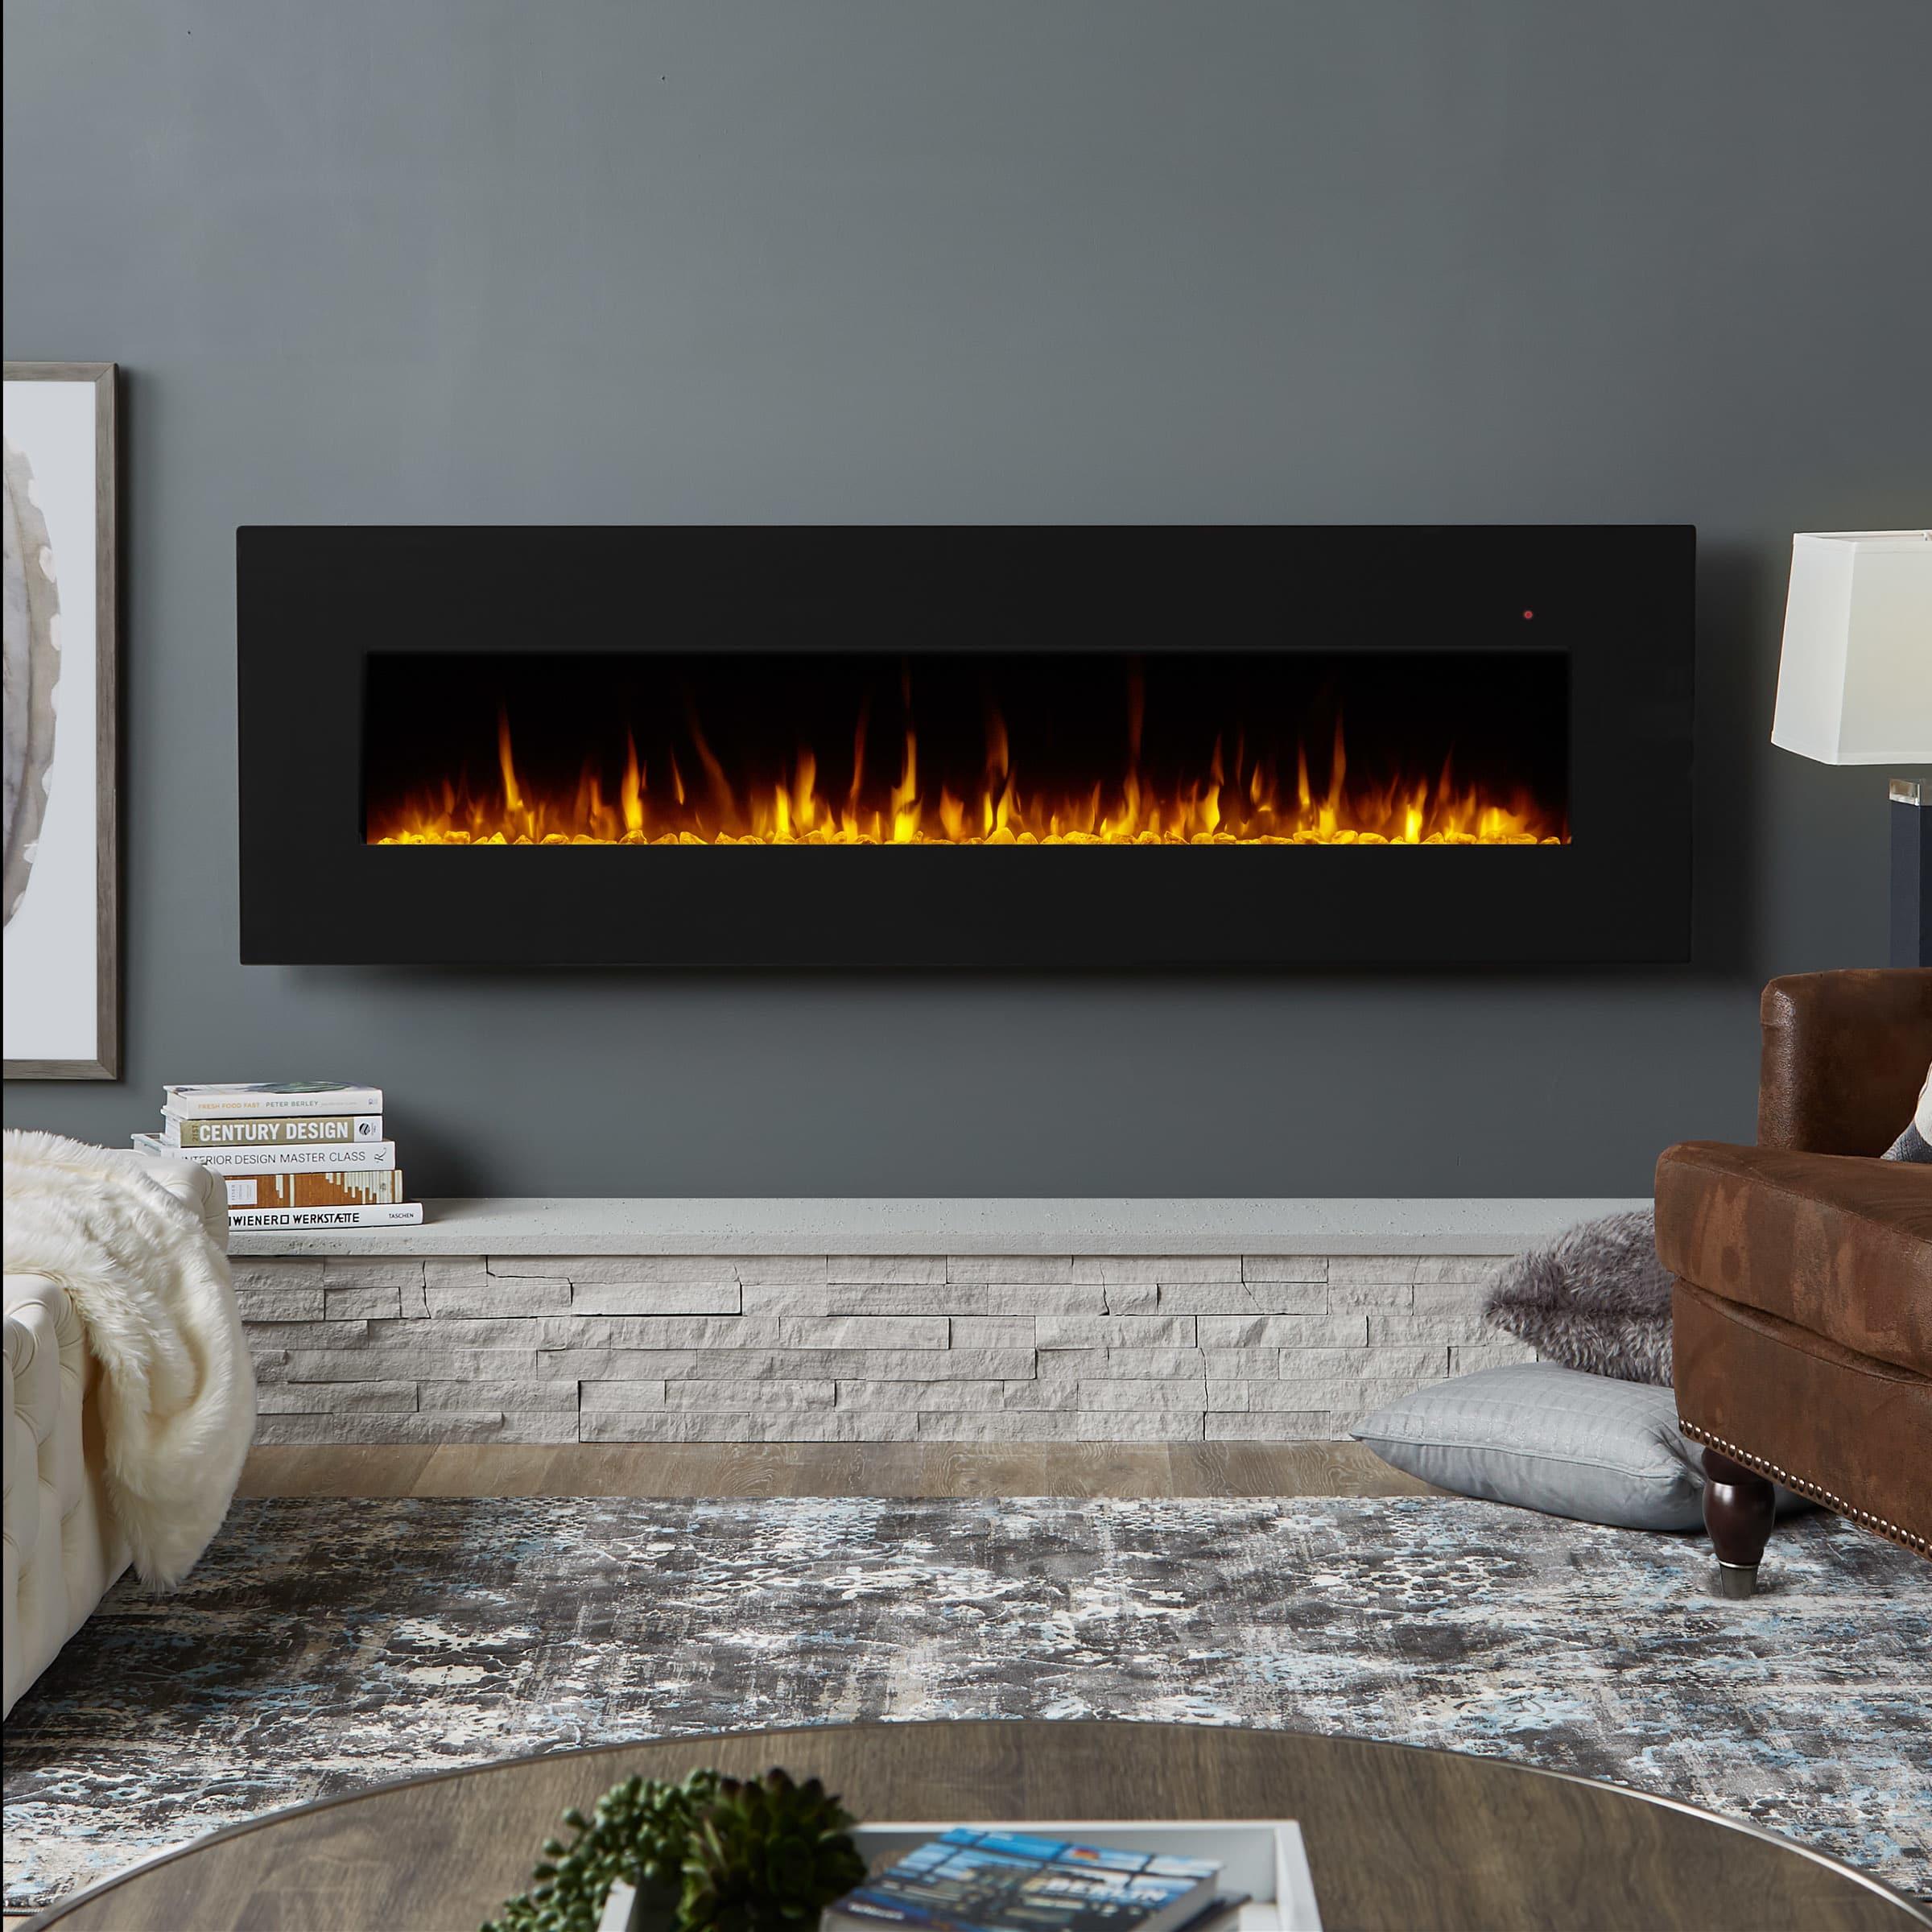 Real Flame Wall Mount Fireplace 1360e